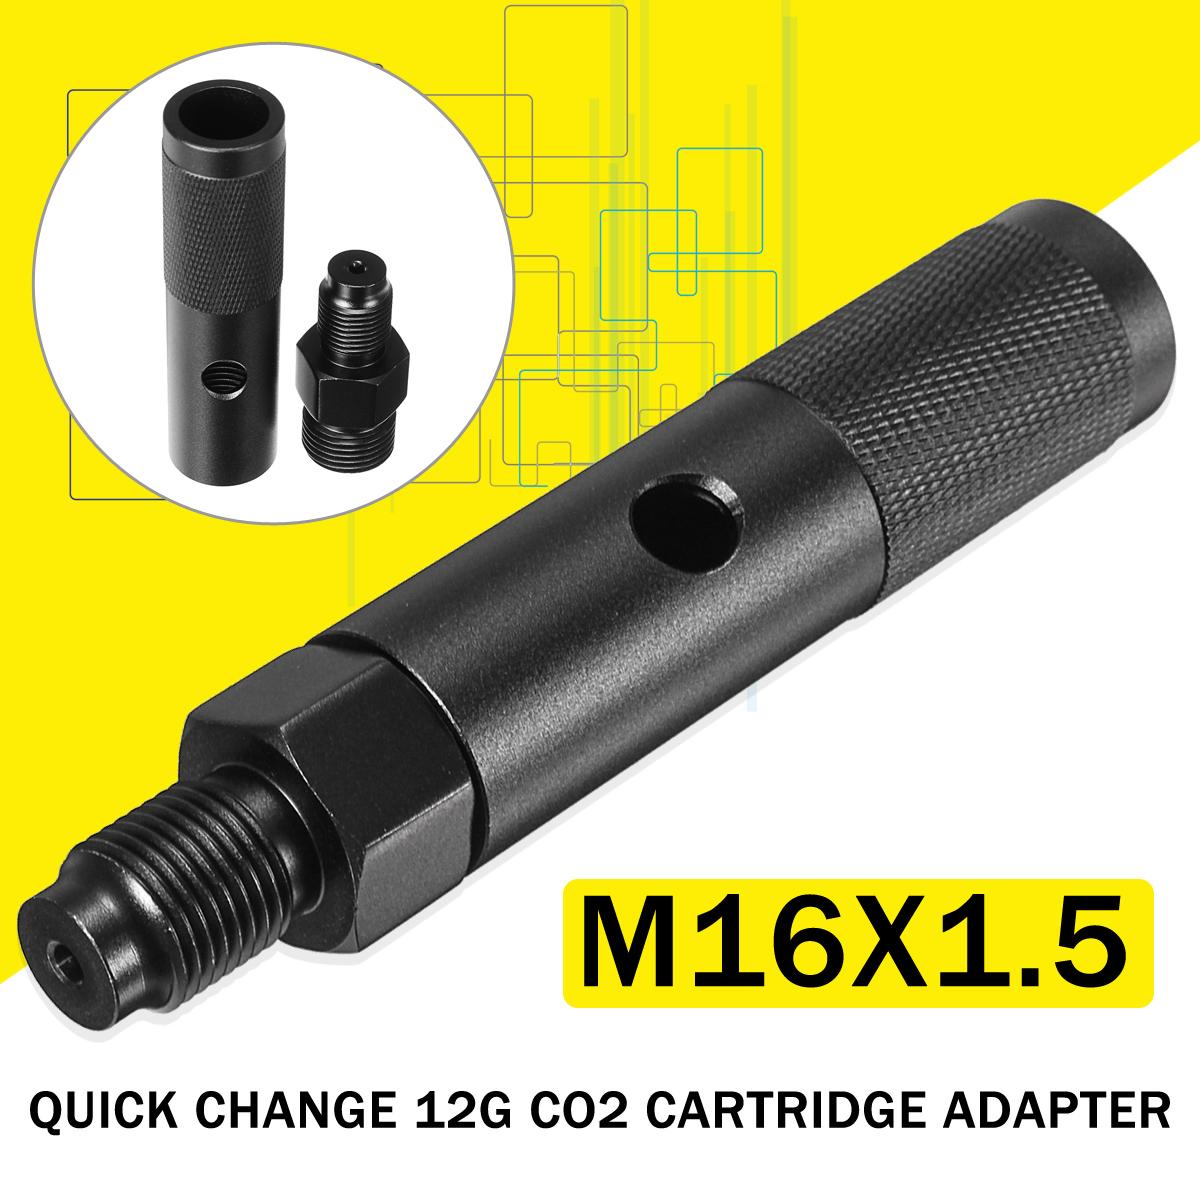 M16x1.5 Thread Quick Change 12g CO2 Valve Cartridge Adapter Machinery Parts